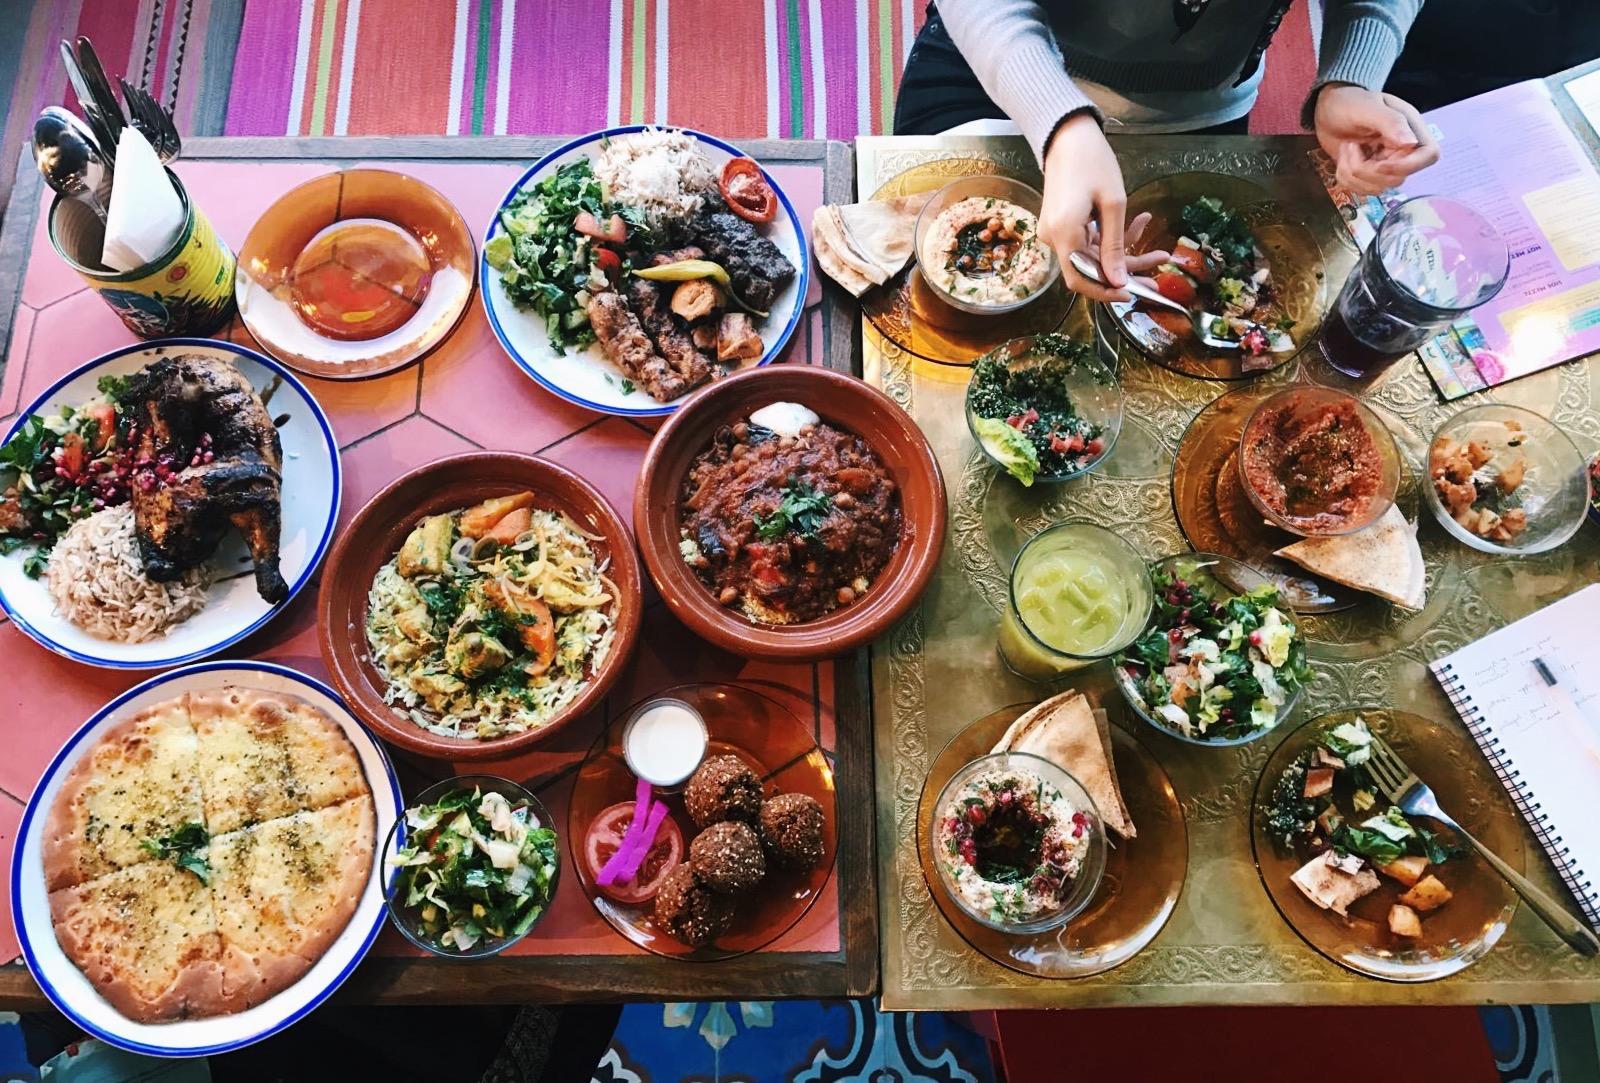 Comptoir Libanais: a visual and culinary treat